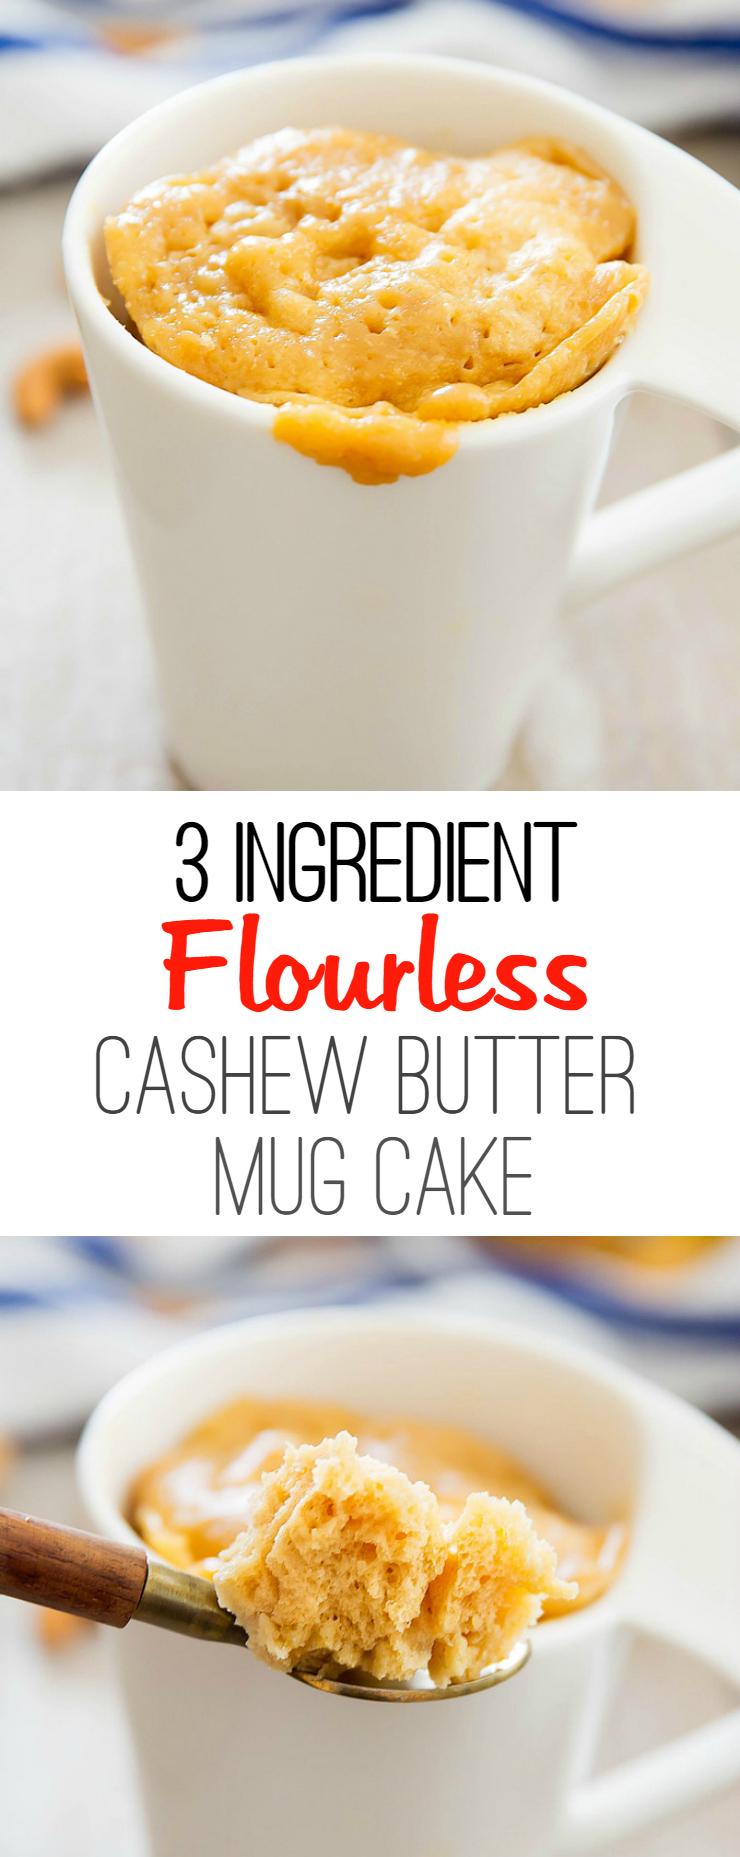 3-ingredient flourless cashew butter mug cake photo collage